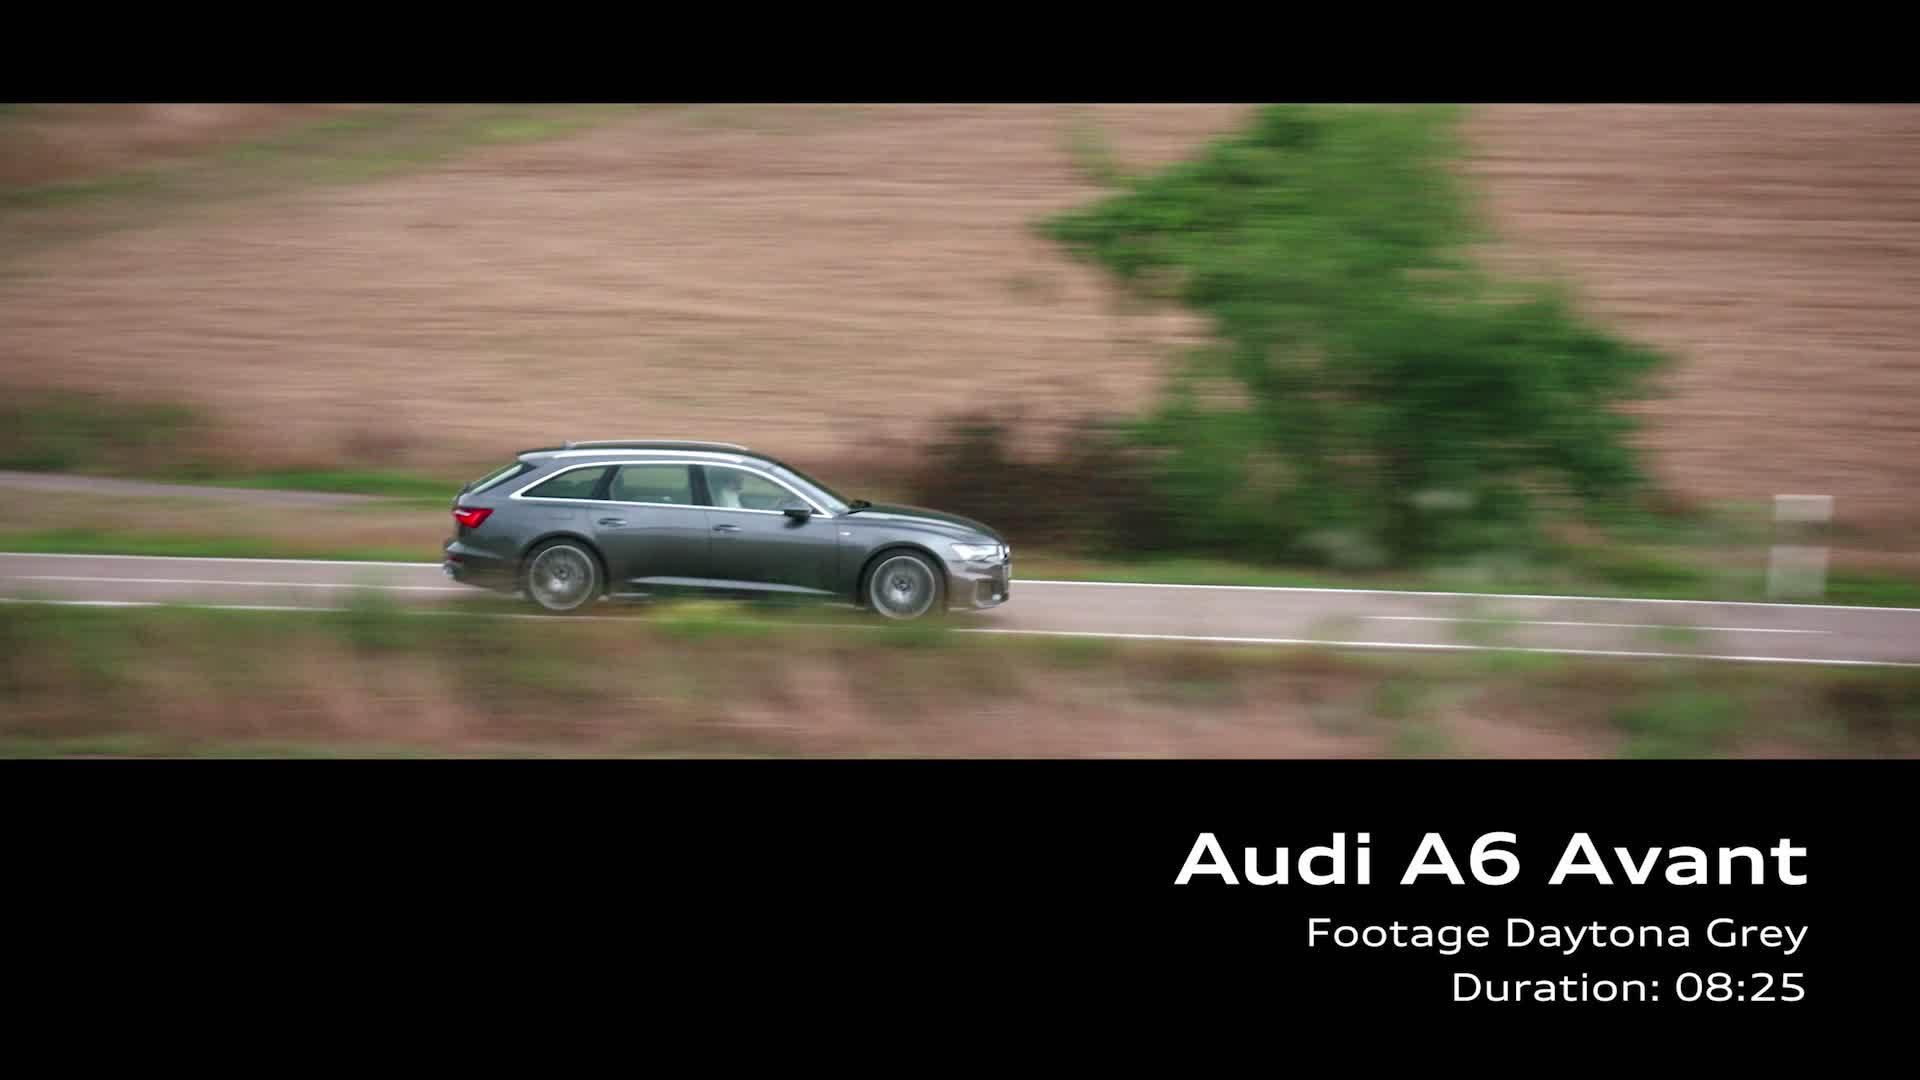 Audi A6 Avant – on Location Footage Daytona Grey